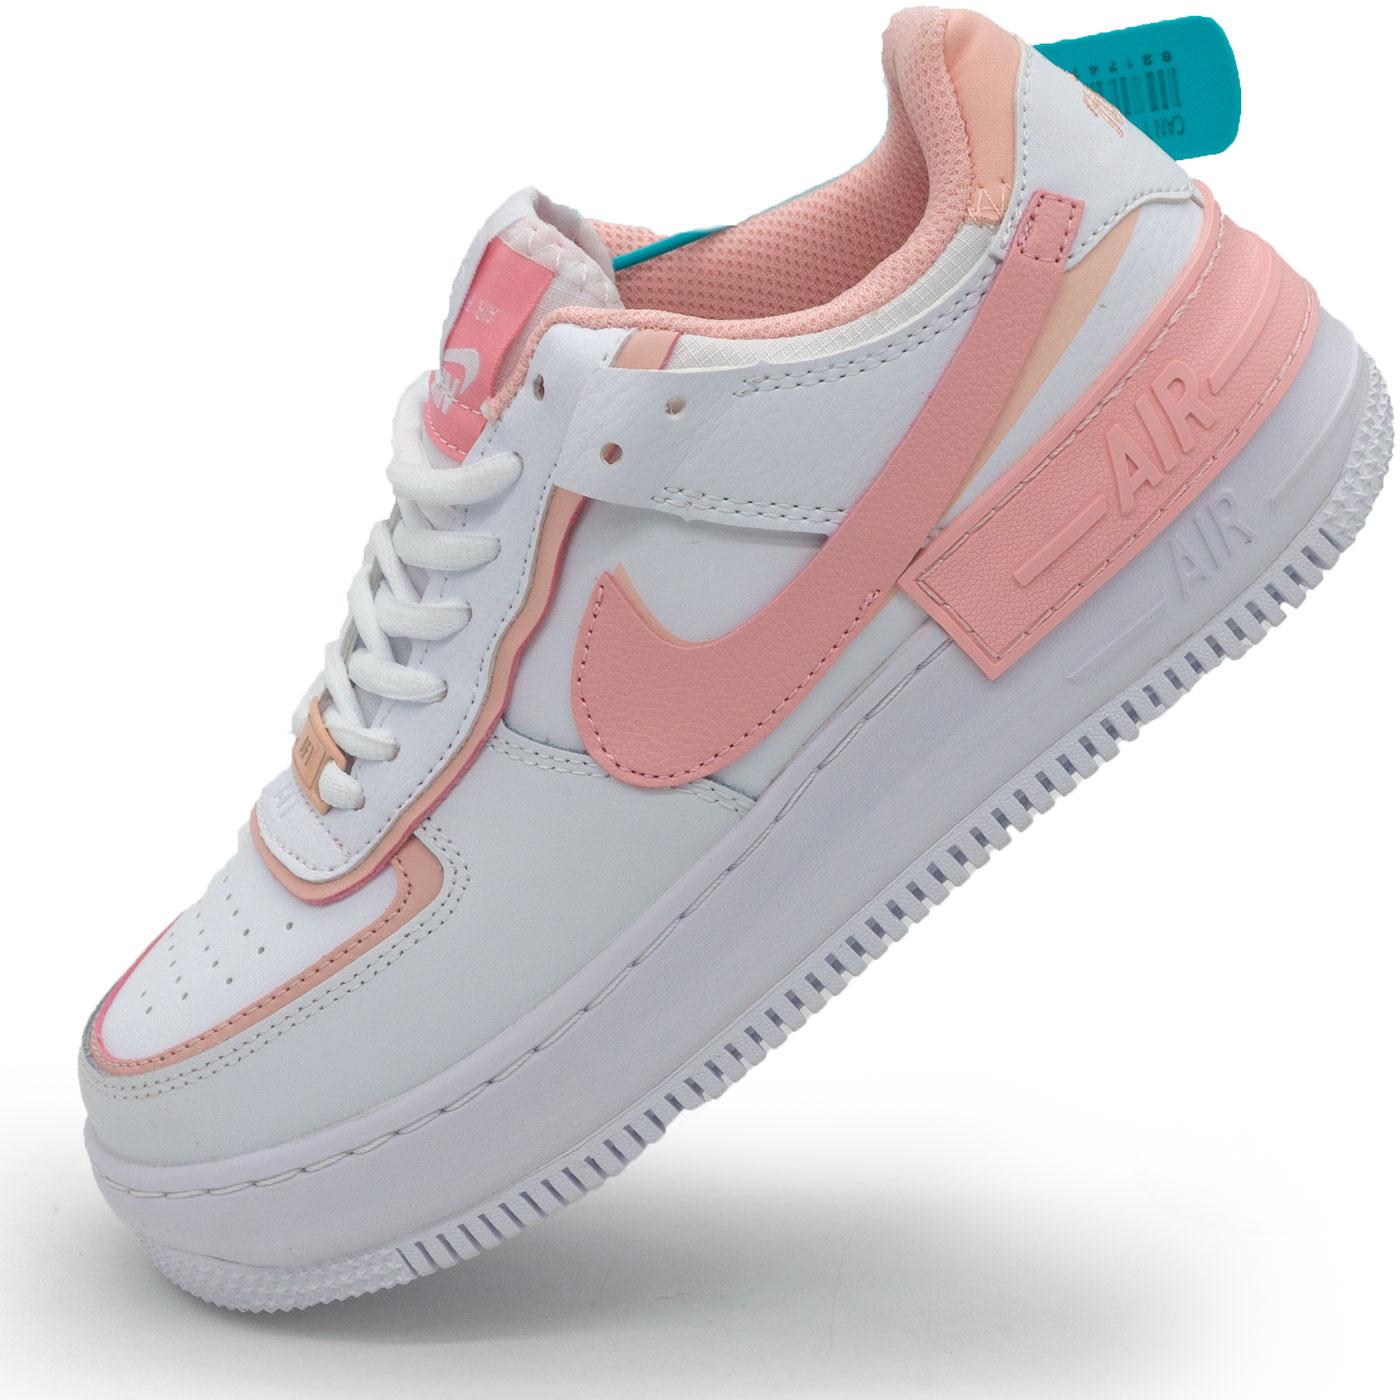 фото main Кроссовки Nike Air Force 1 Shadow бело-розовые - Топ качество main